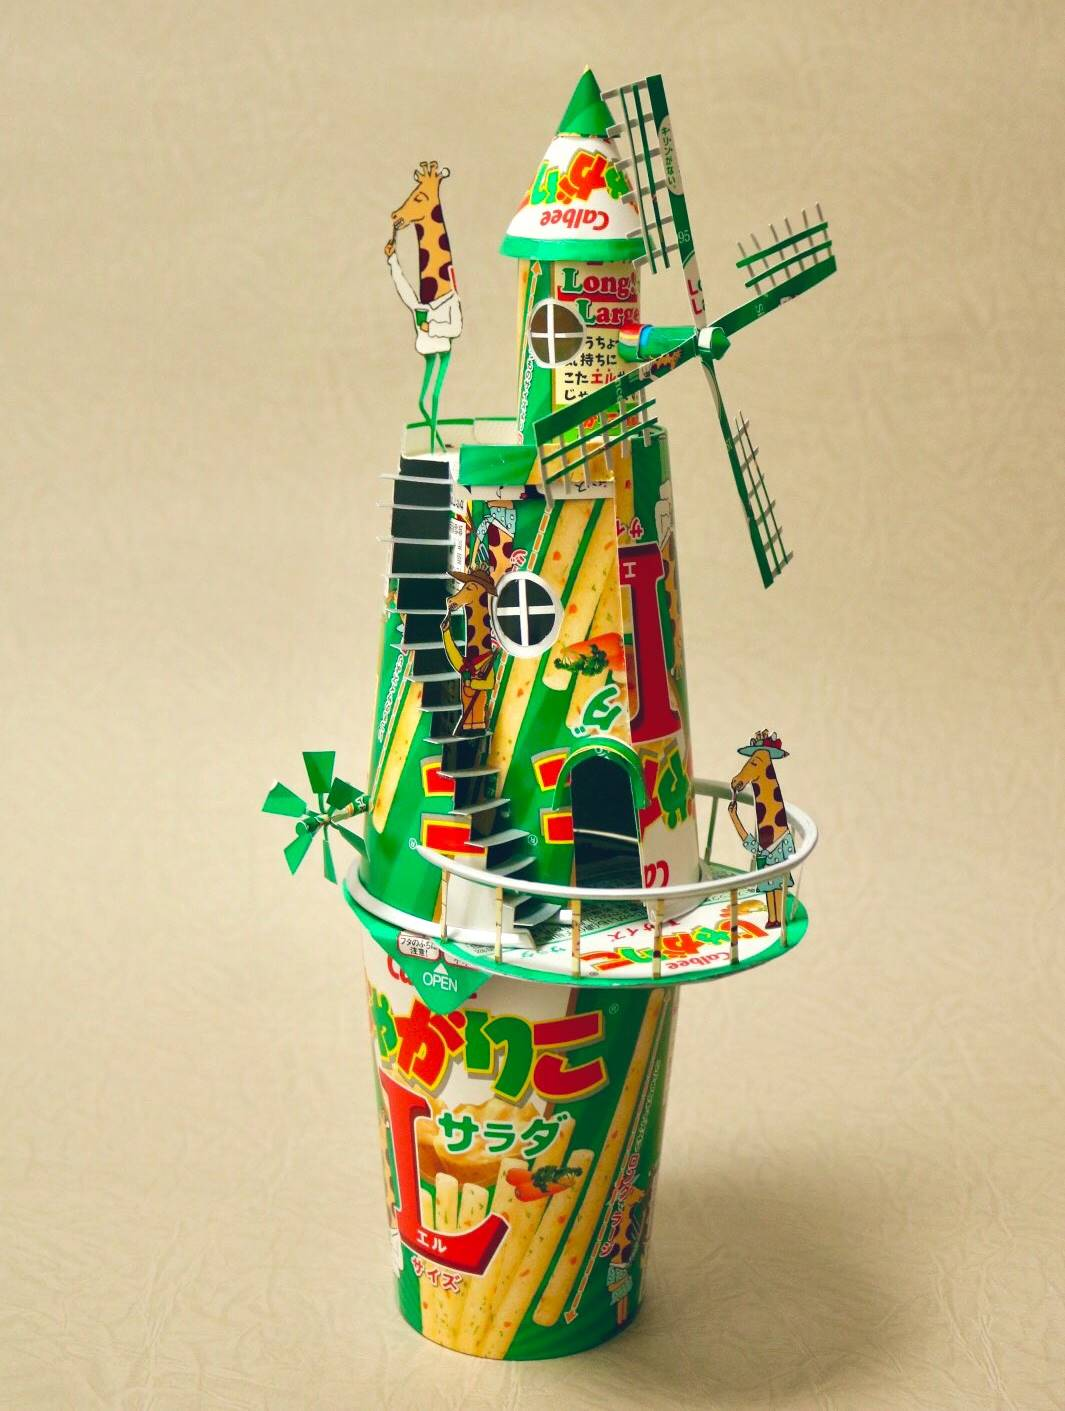 Haruki Japanese Paper Sculptor Awesomebyte Image 12